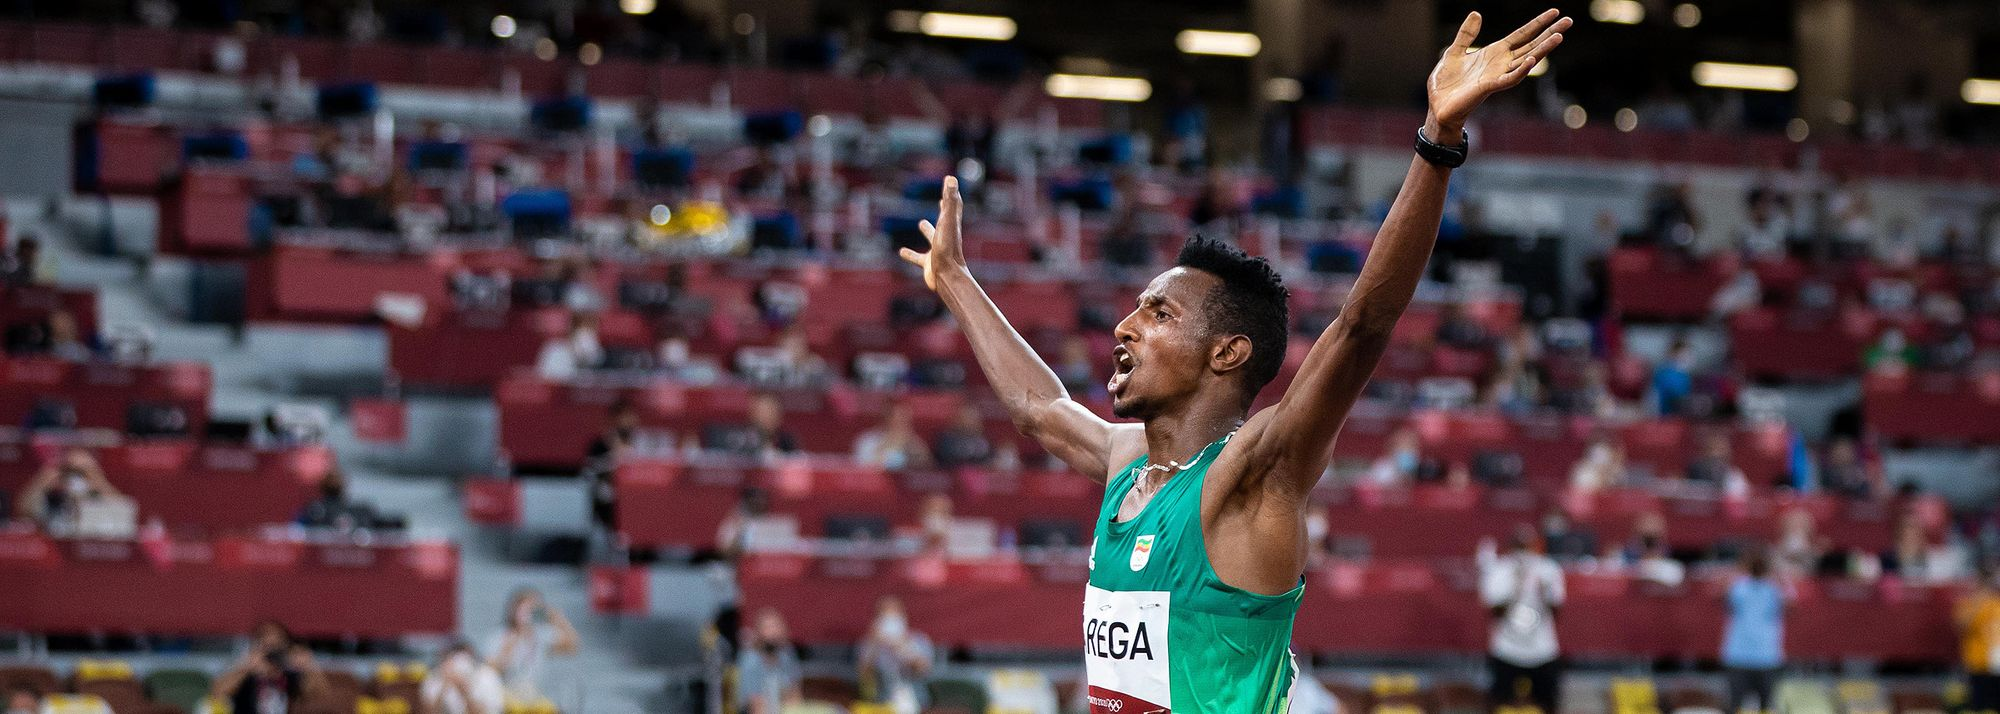 Selemon Barega gave a distance-running masterclass to win the men's 10,000m.